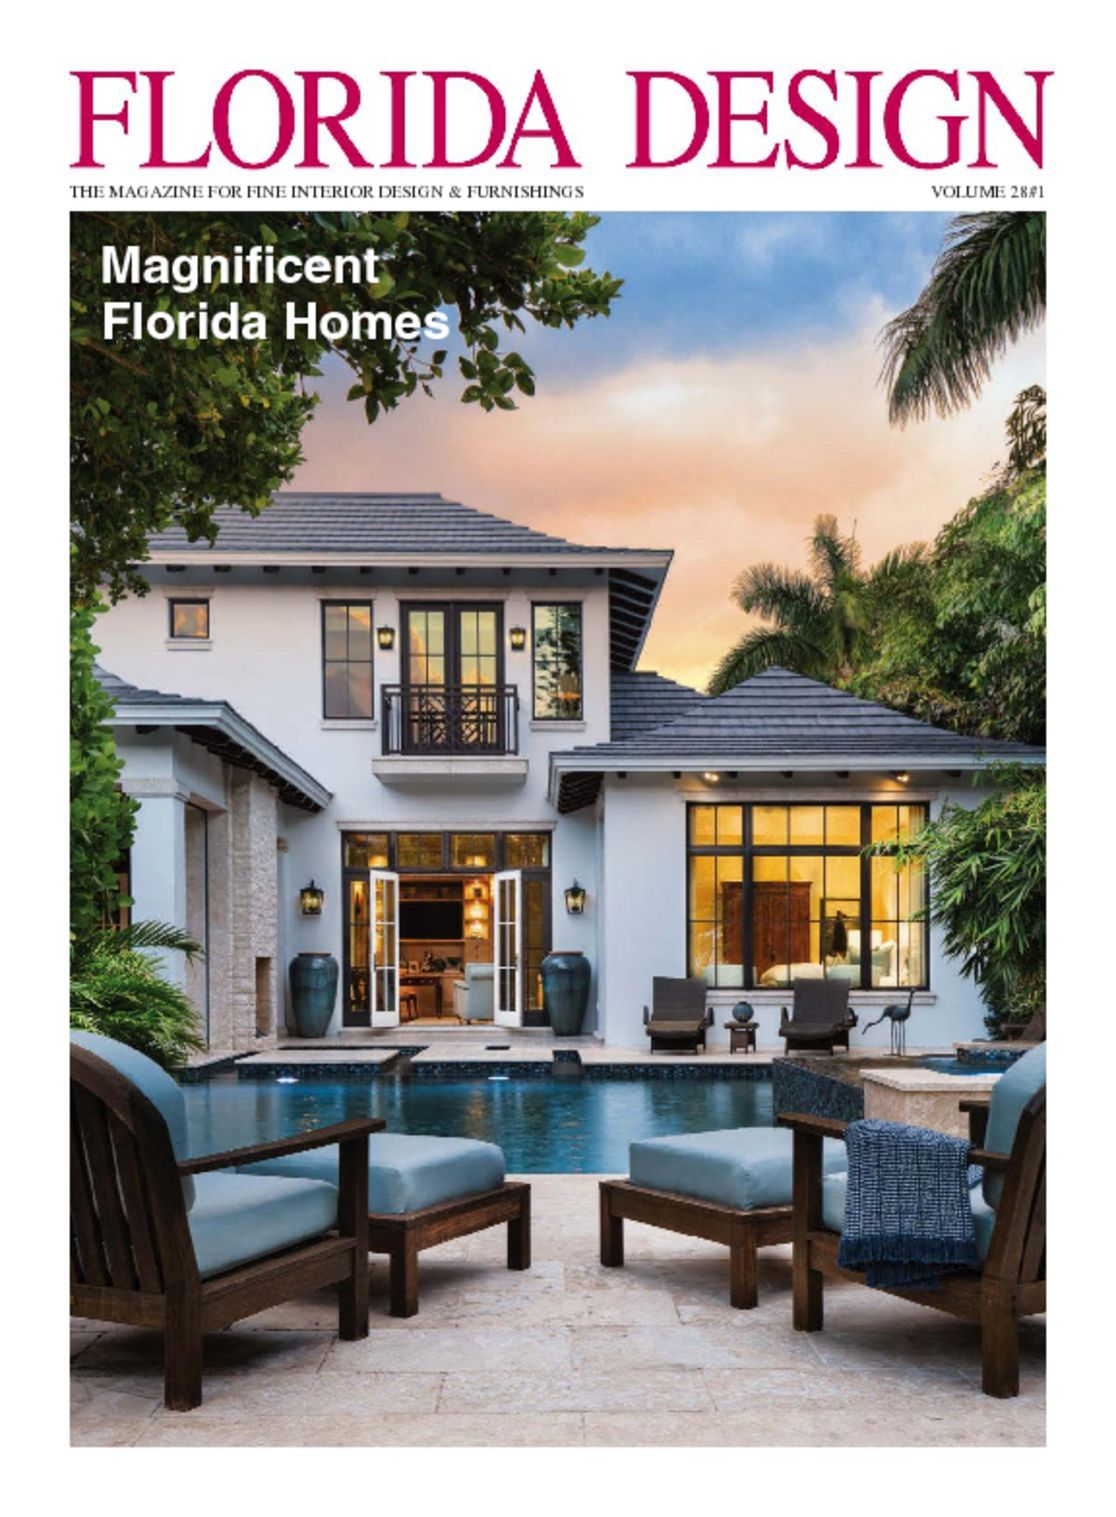 Florida design magazine digital for Florida design